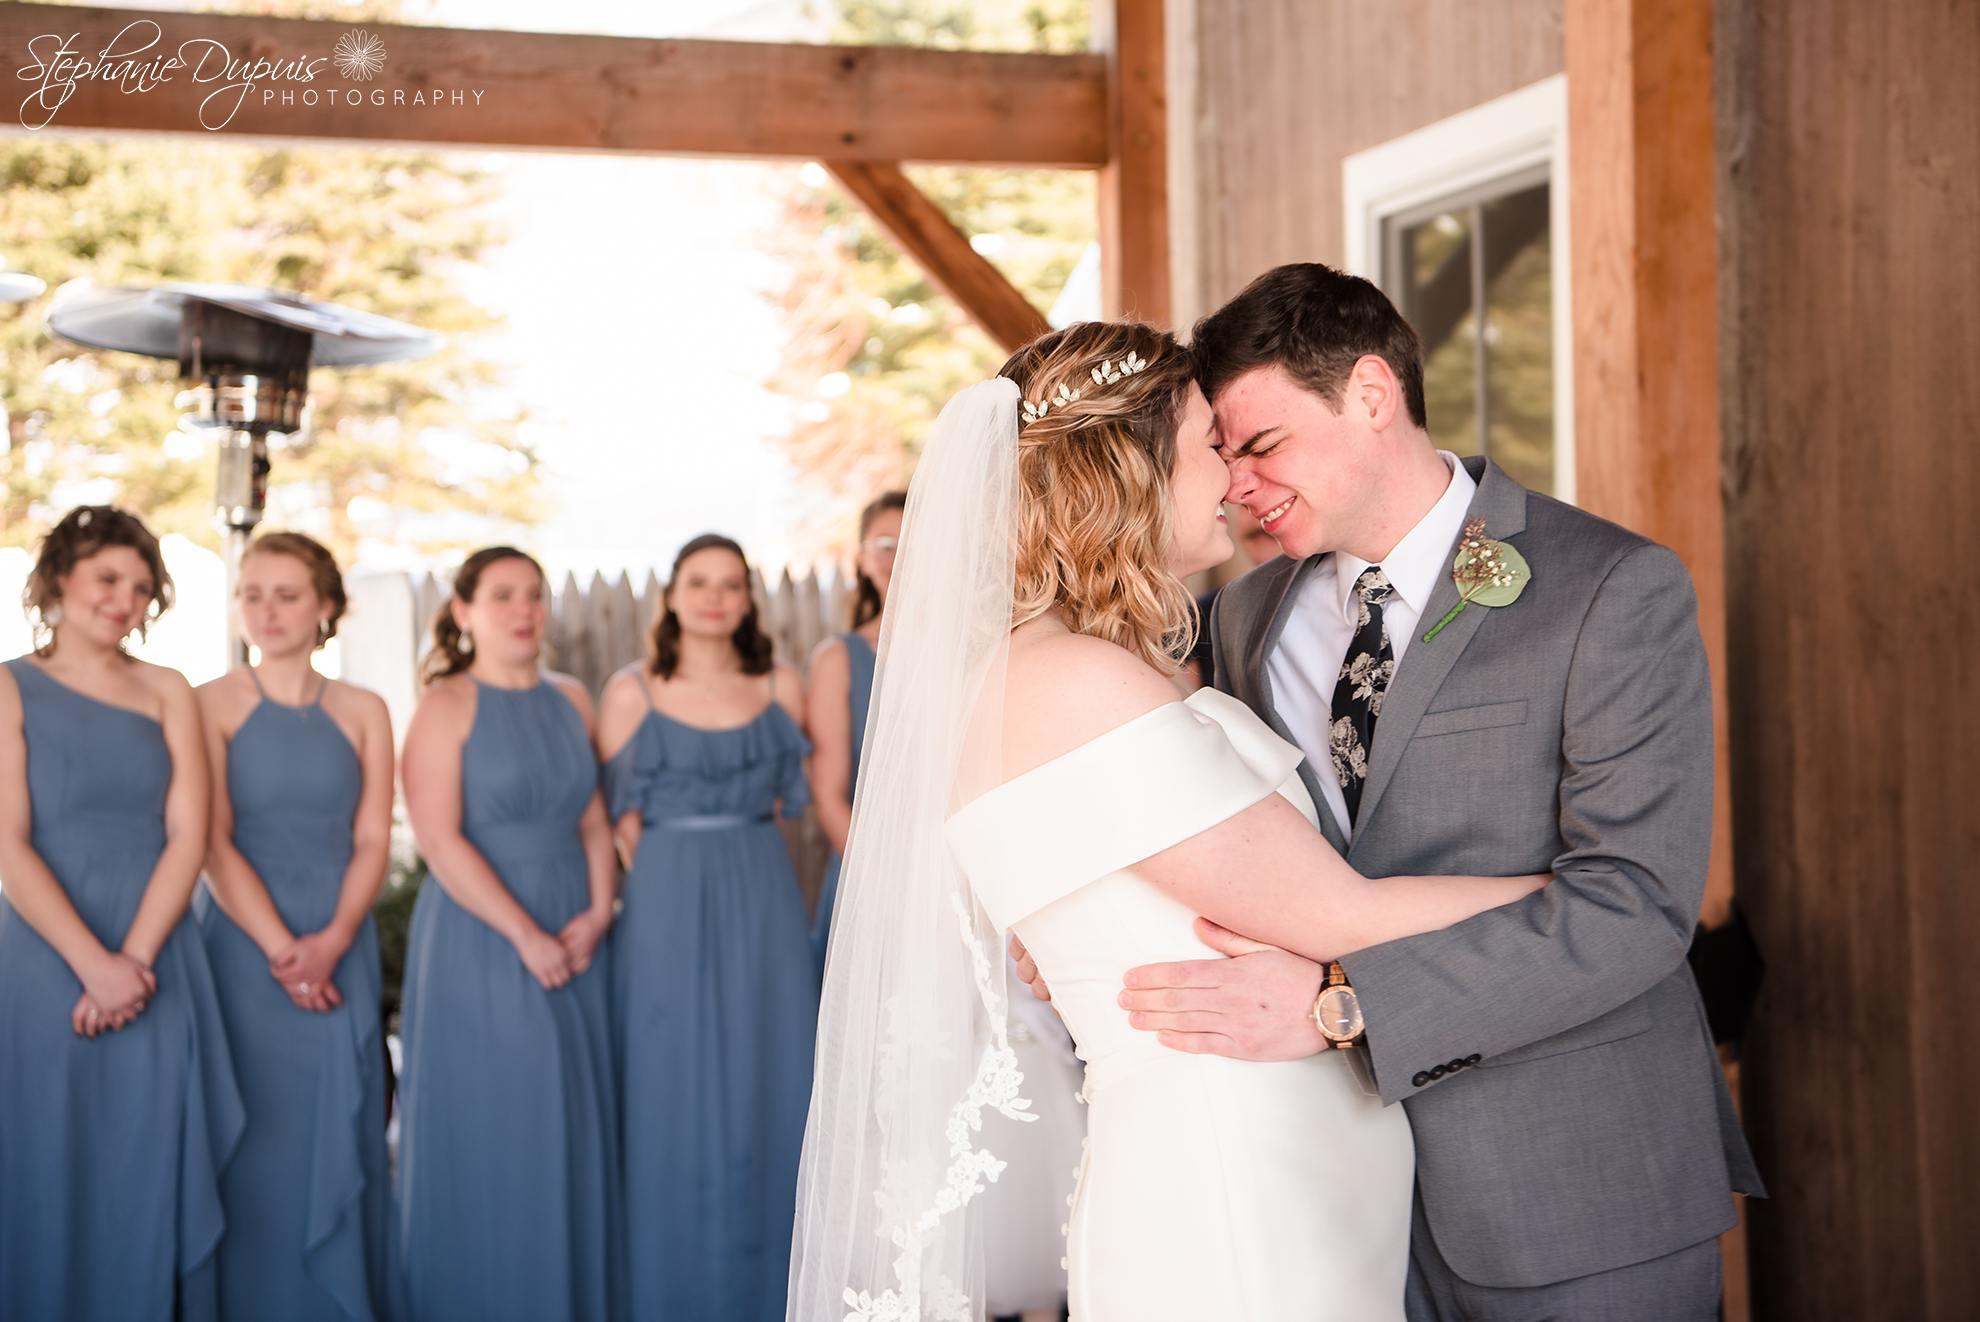 Jefferson Wedding Photographer 03 3 - Portfolio: Kittle Wedding